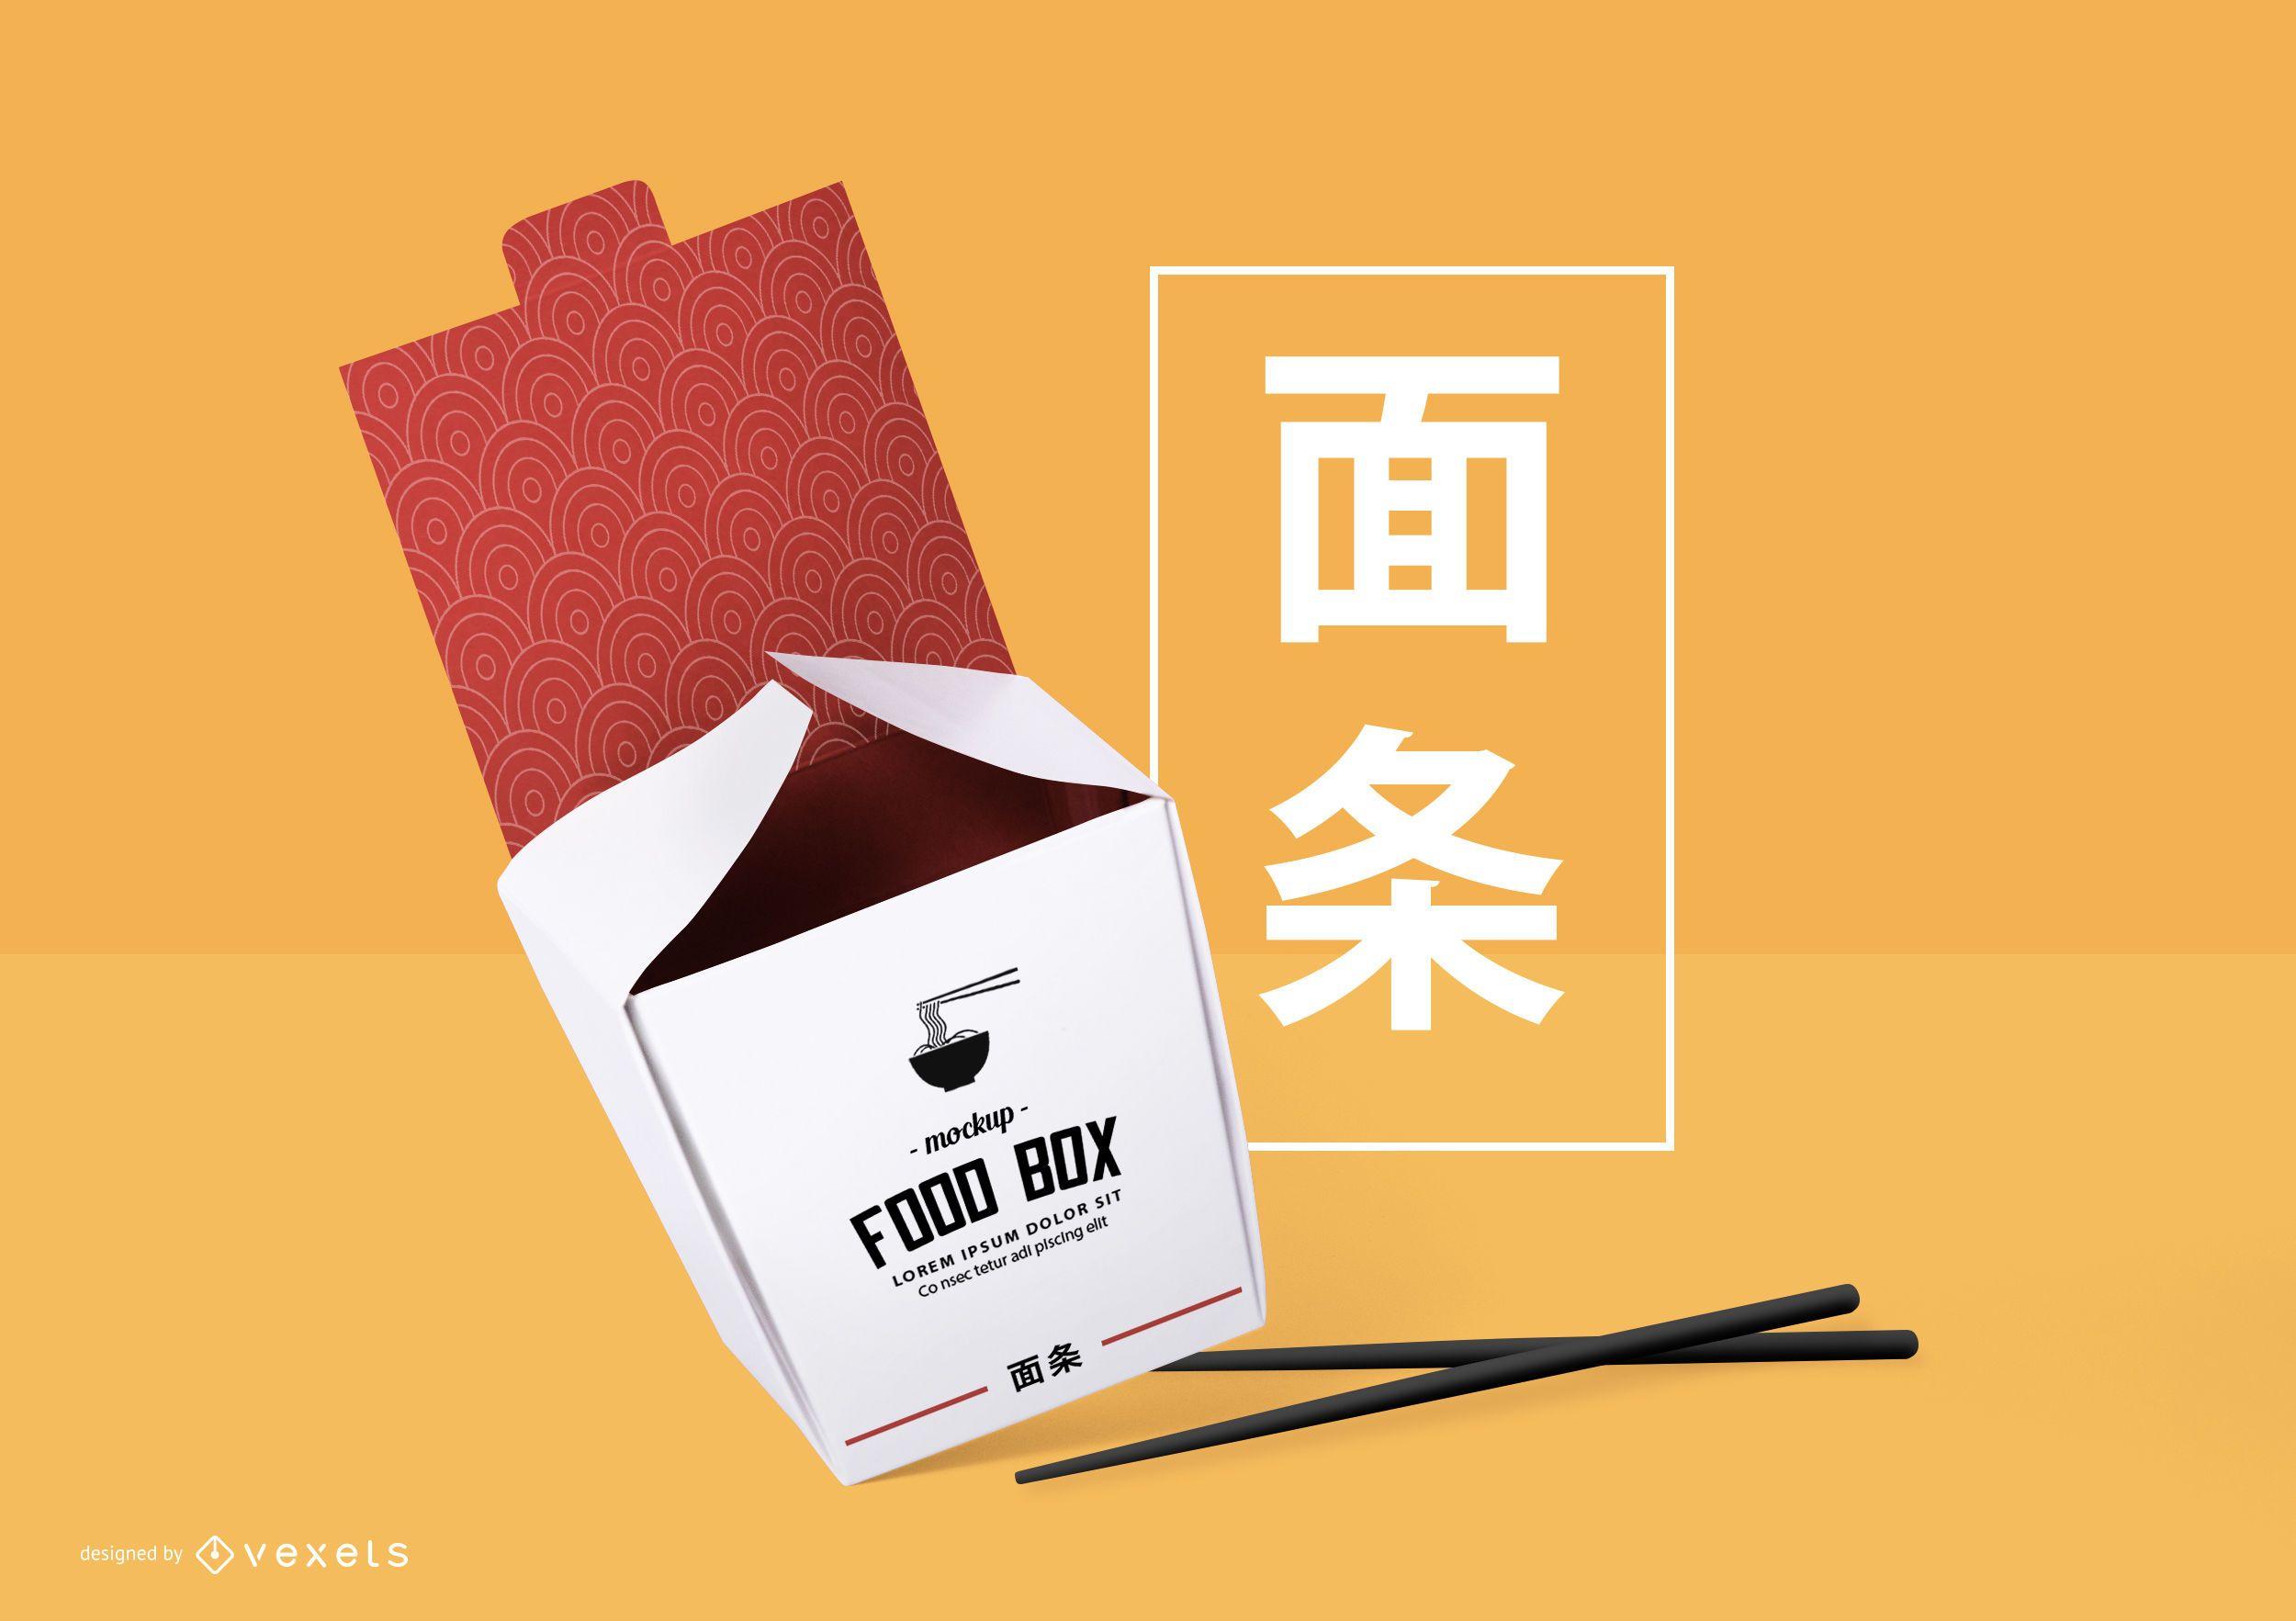 Chinese food packaging mockup psd